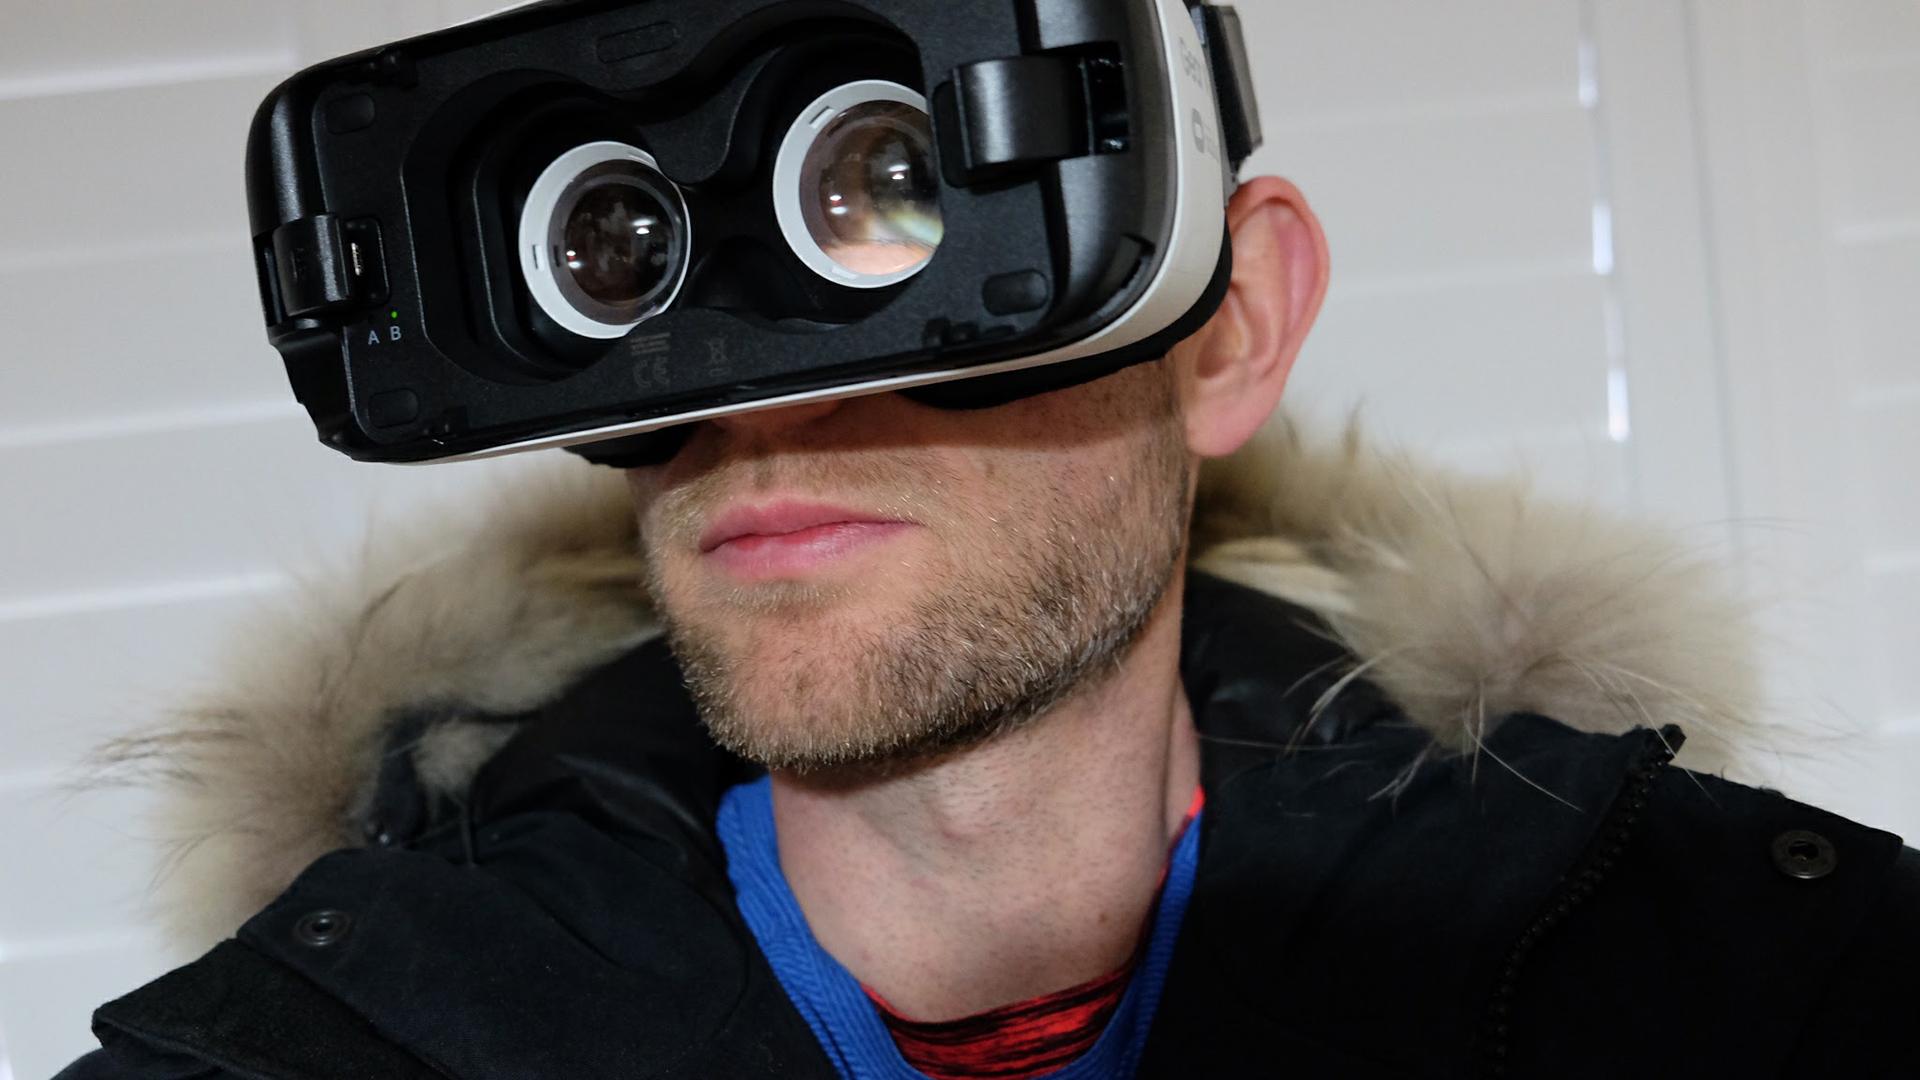 wireless 8K VR headset